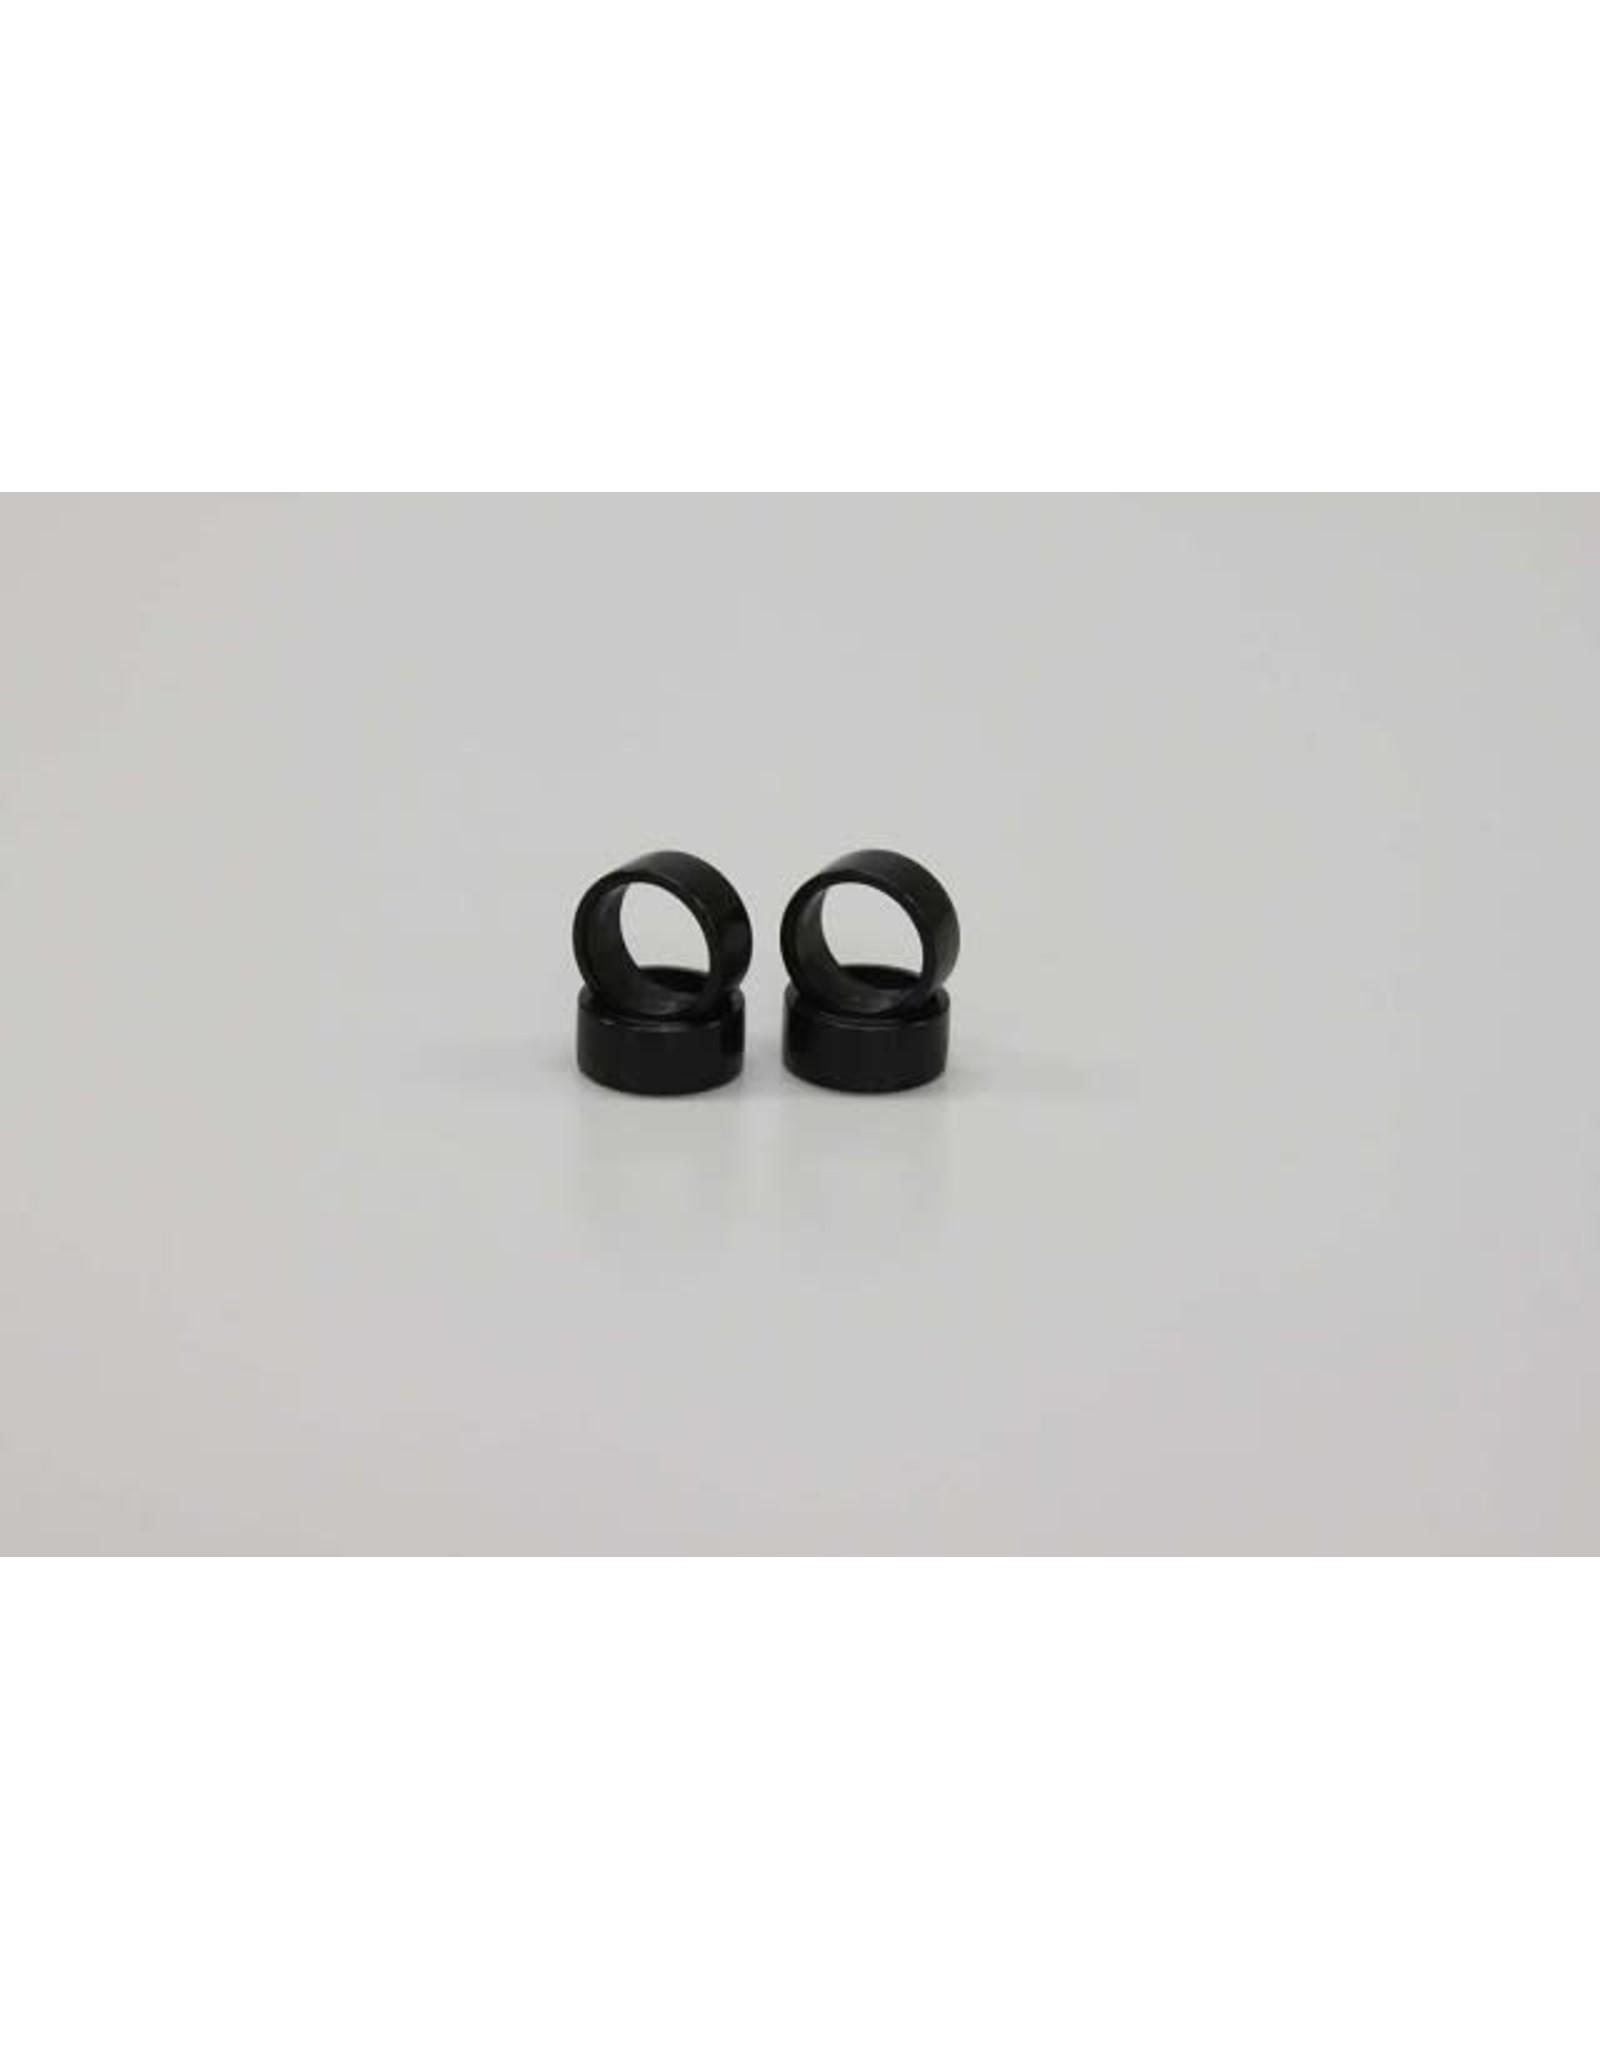 Kyosho Drifting Tire  set (8.5mm/AWD/4pc) MDT002